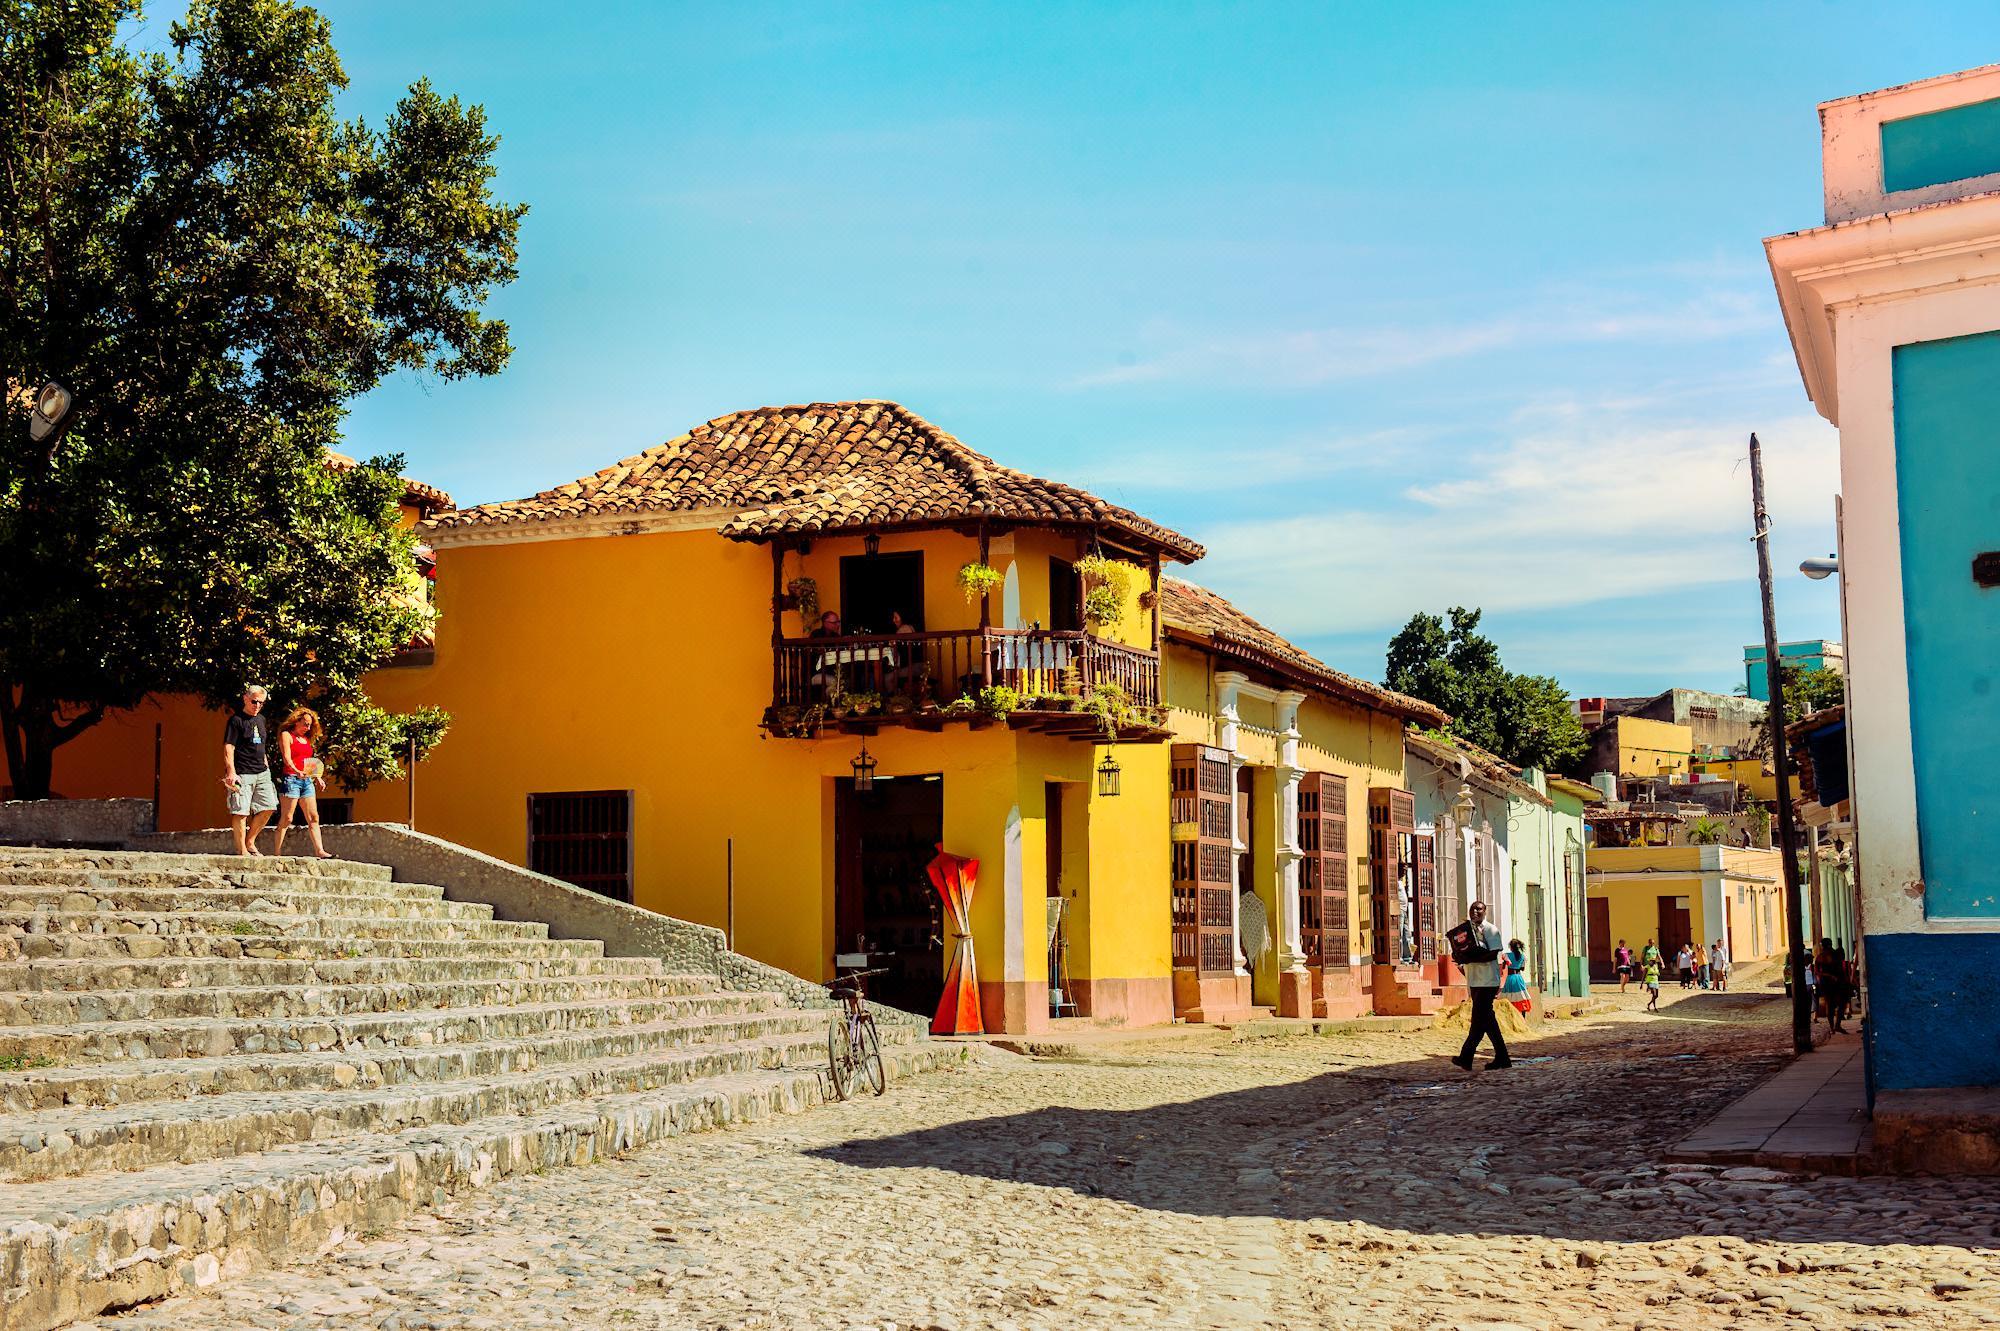 Trinidad's old town